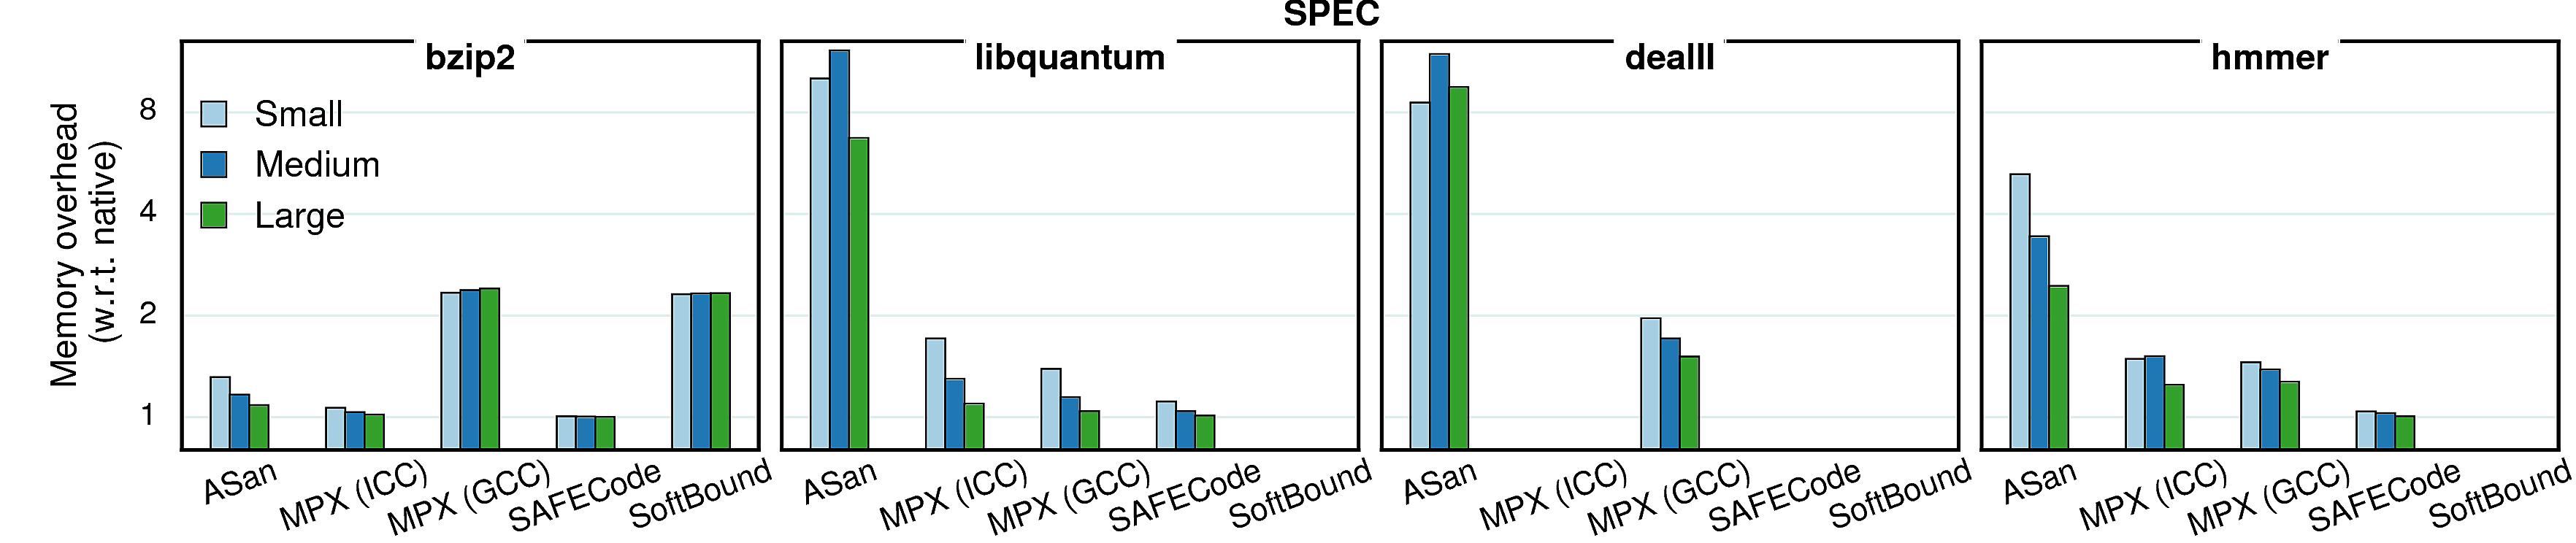 Varying inputs - memory (SPEC)